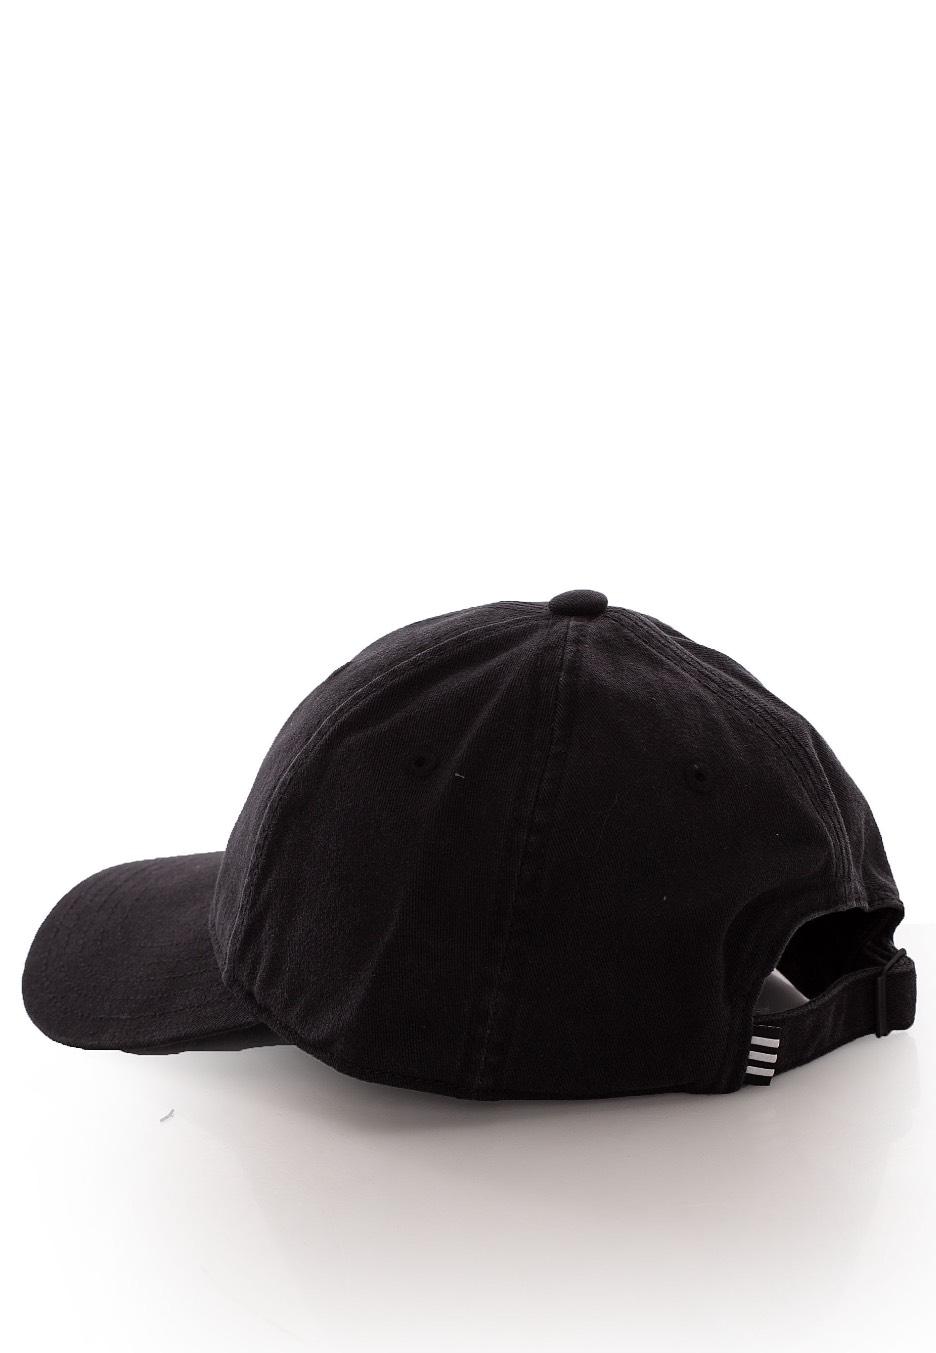 49506a2e1fd Adidas - Adilcolor Washed Black White - Cap - Streetwear Shop ...